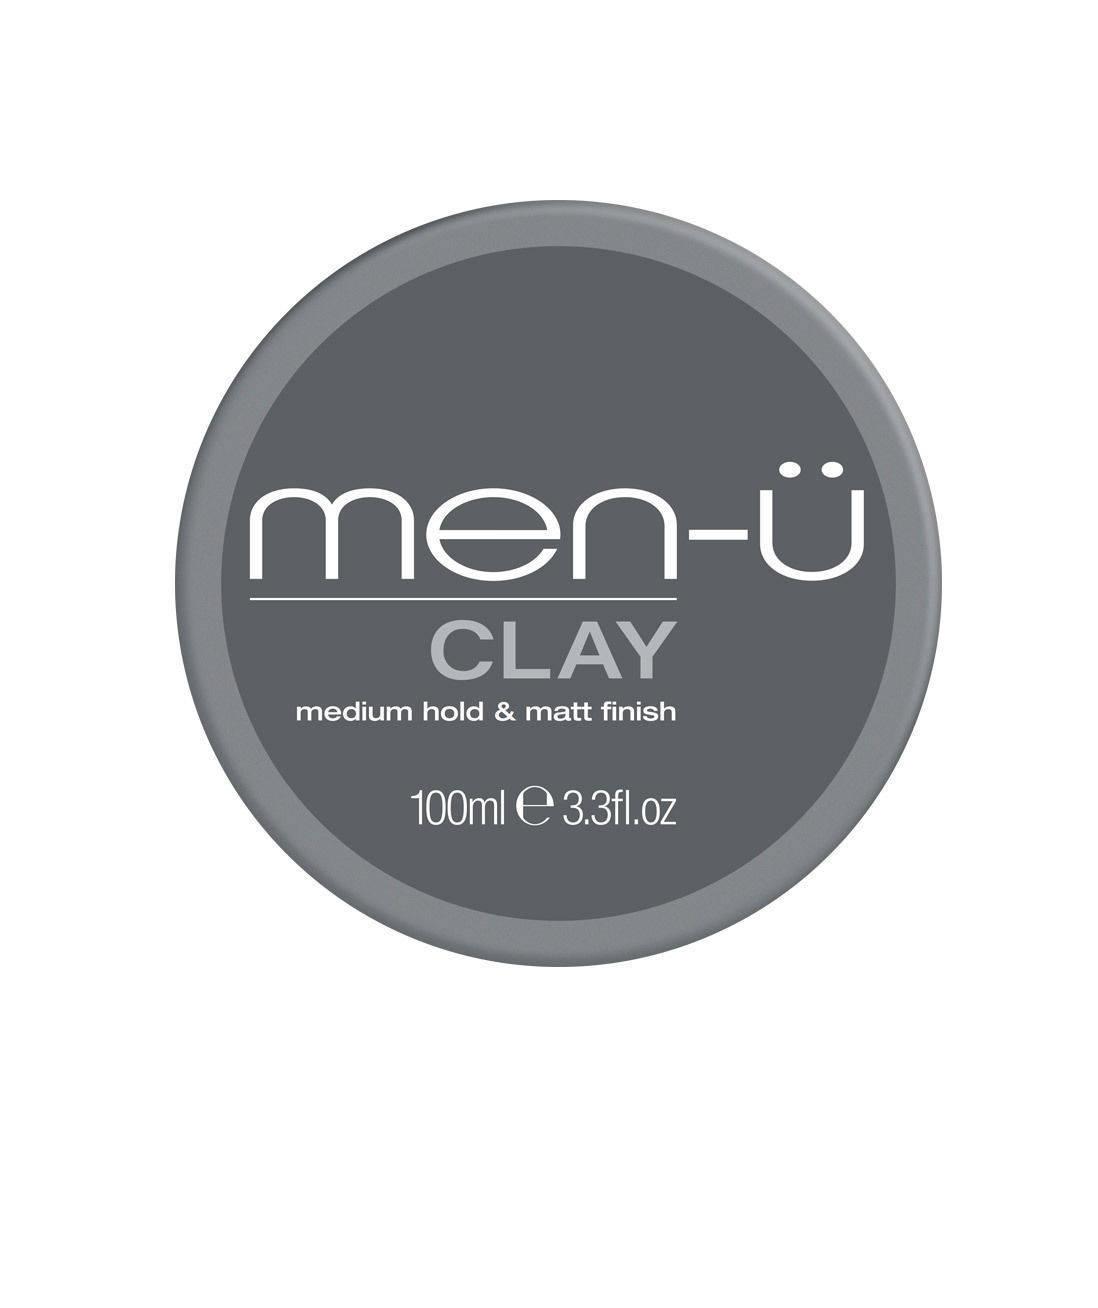 Men-ü clay